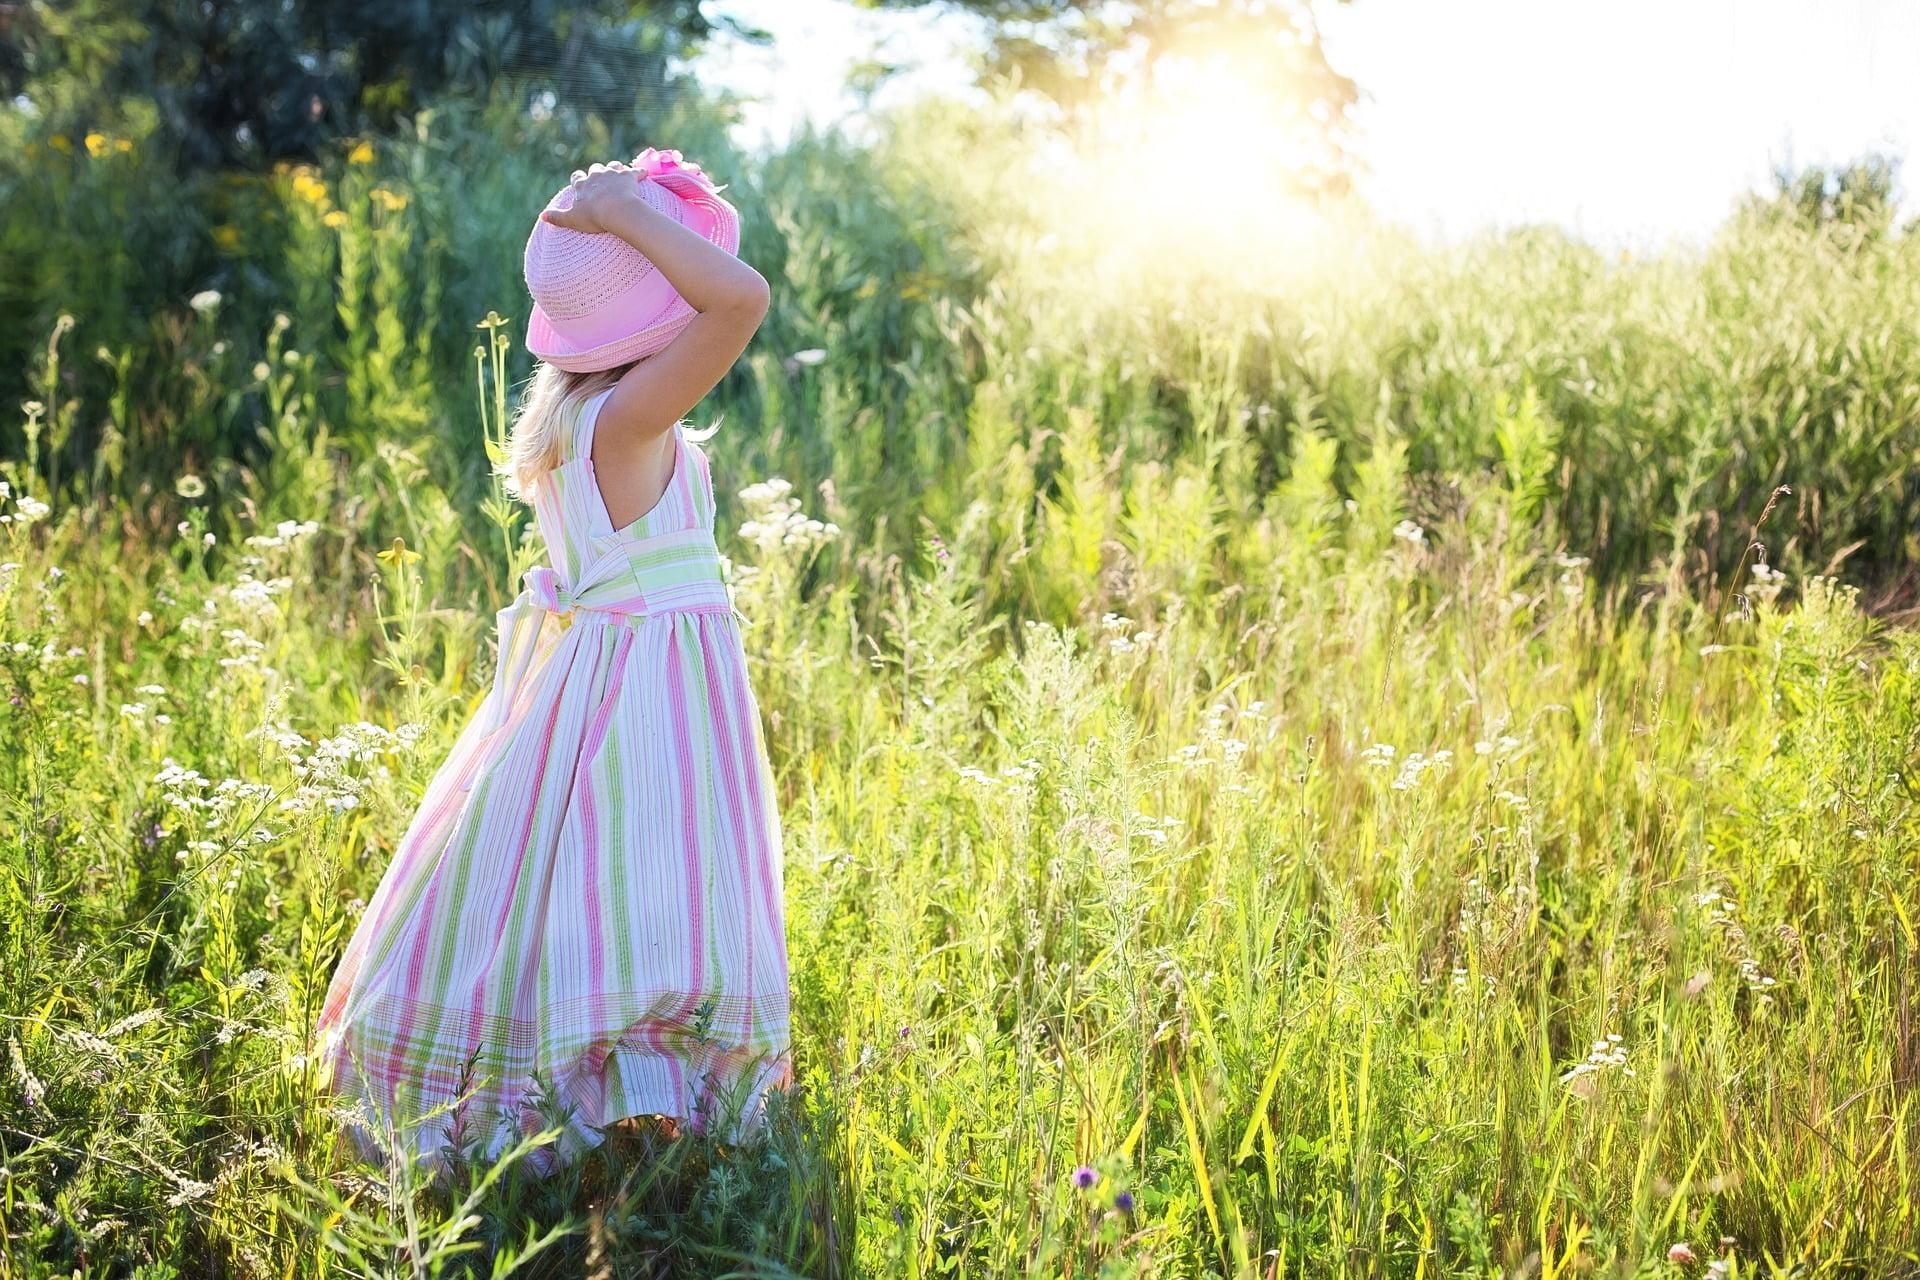 proteggere-pelle-bambini